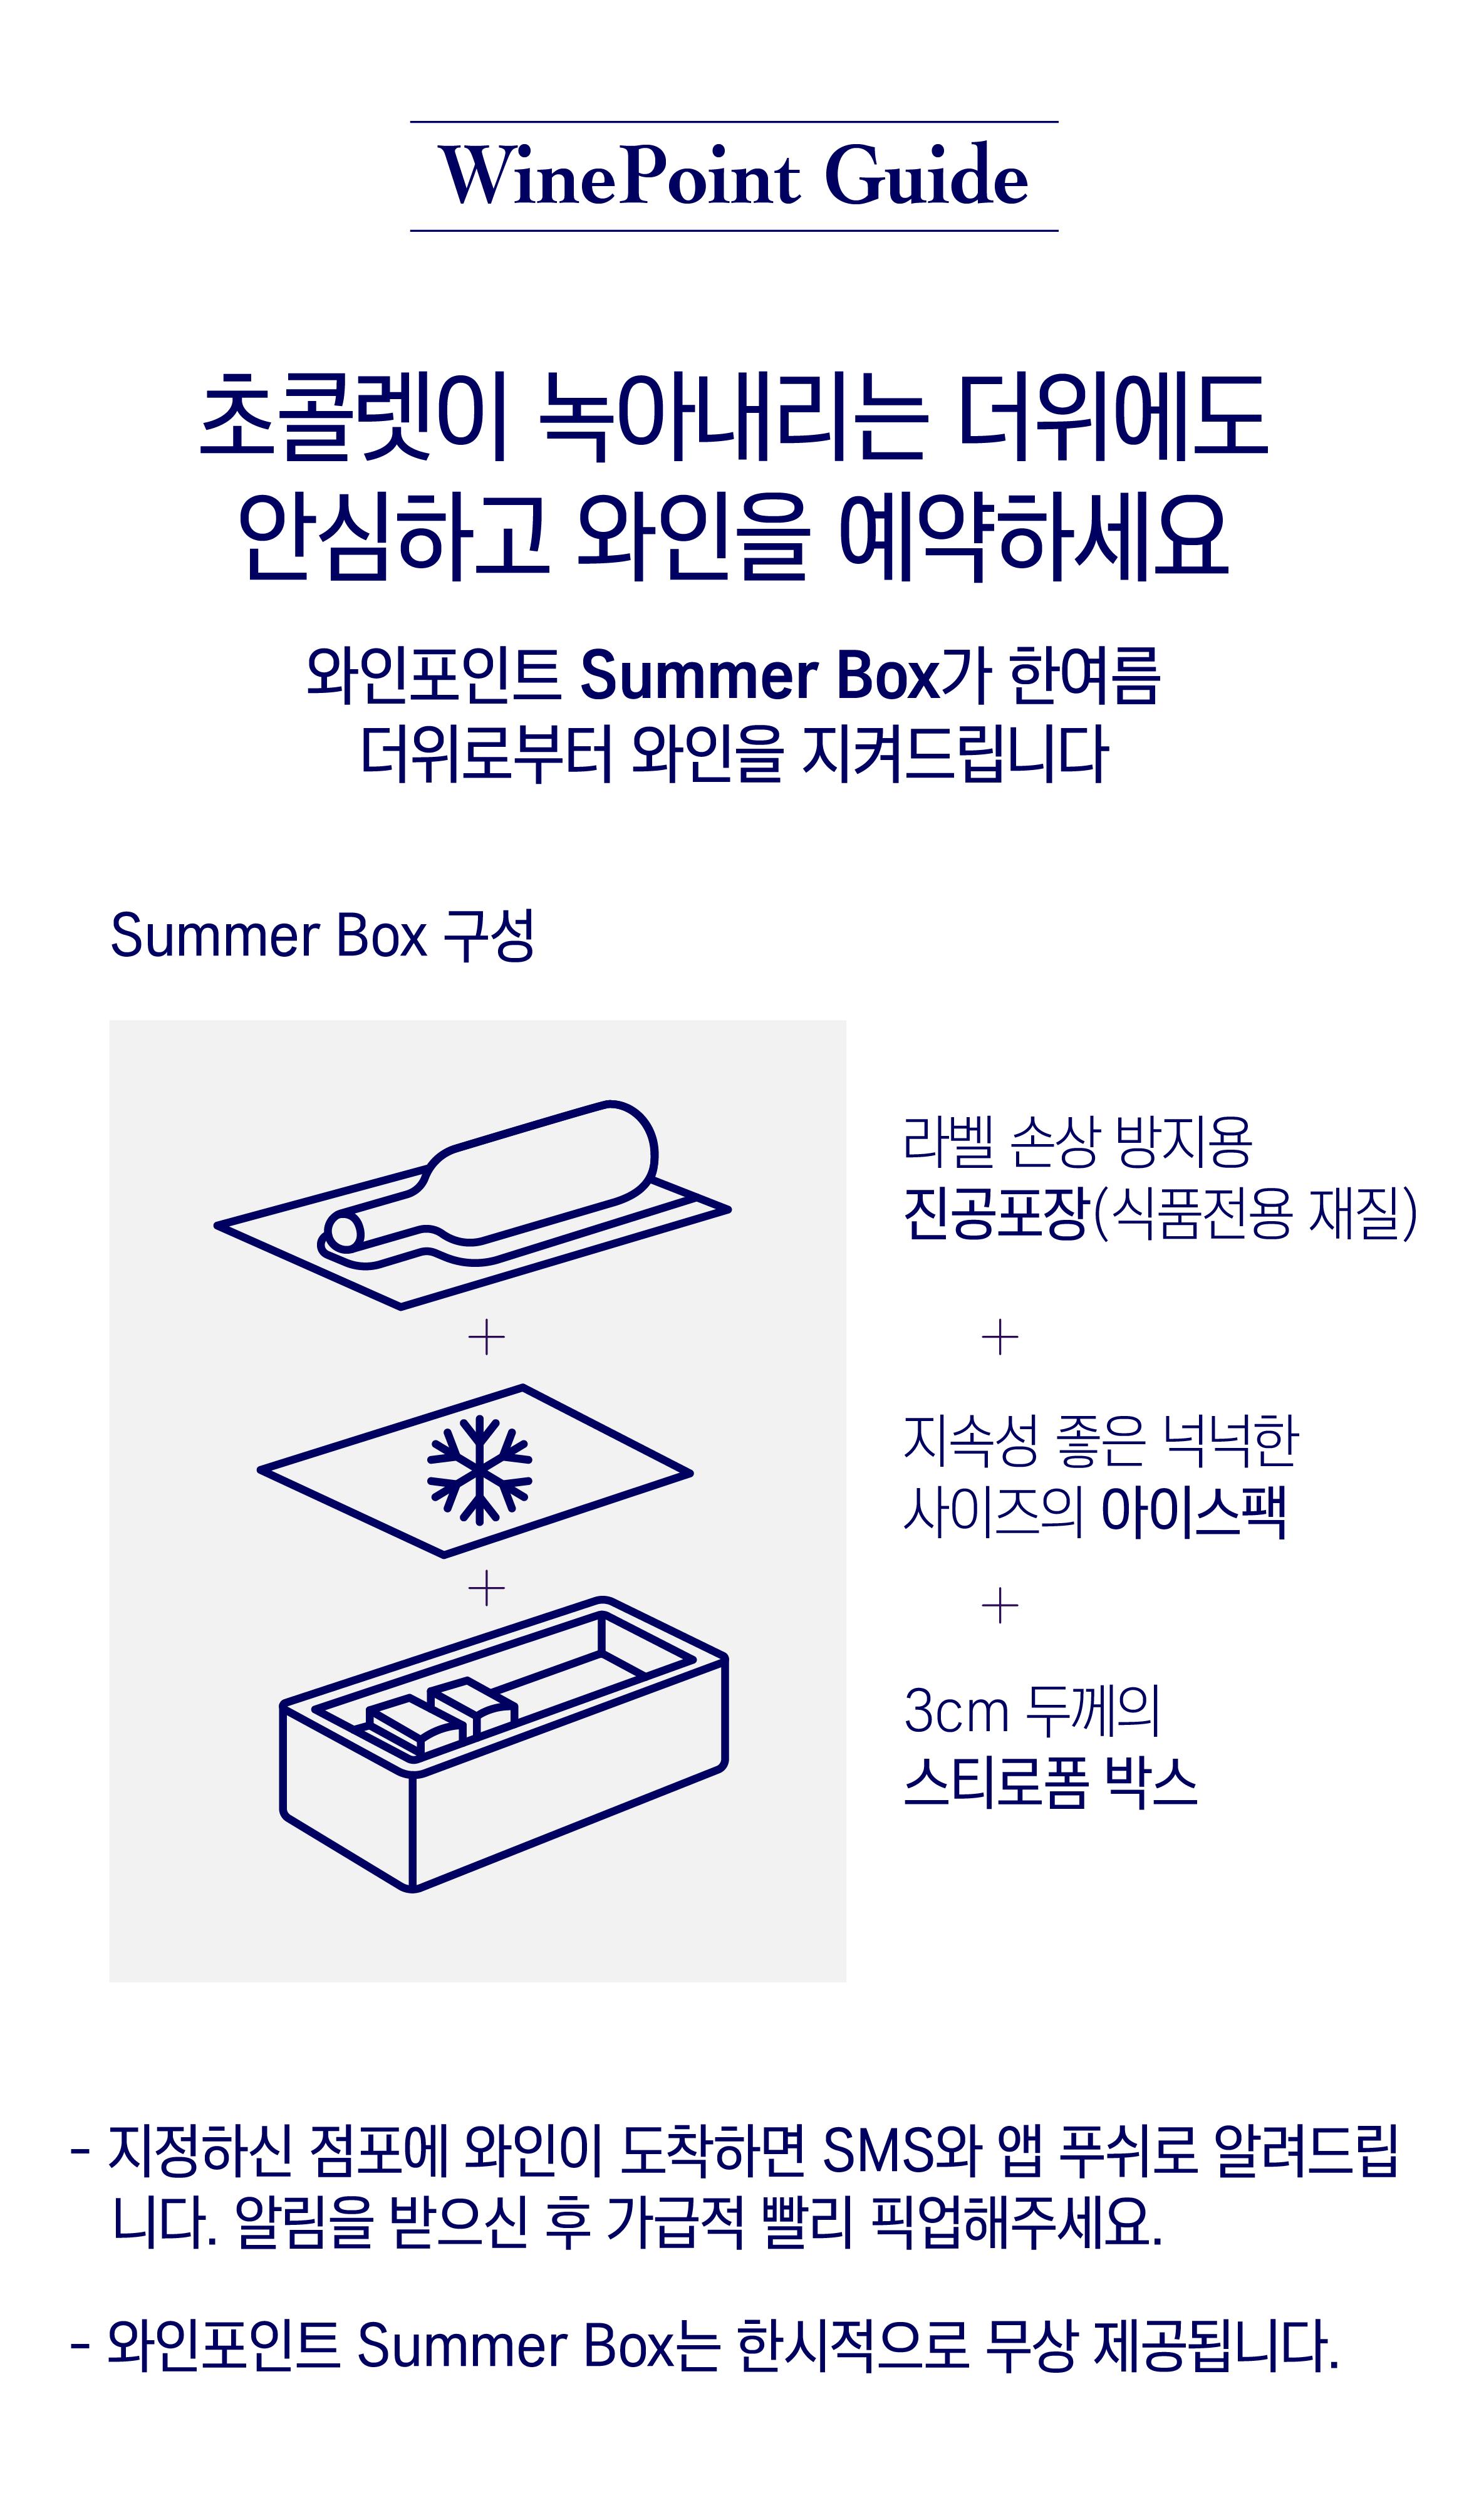 WP summer box info